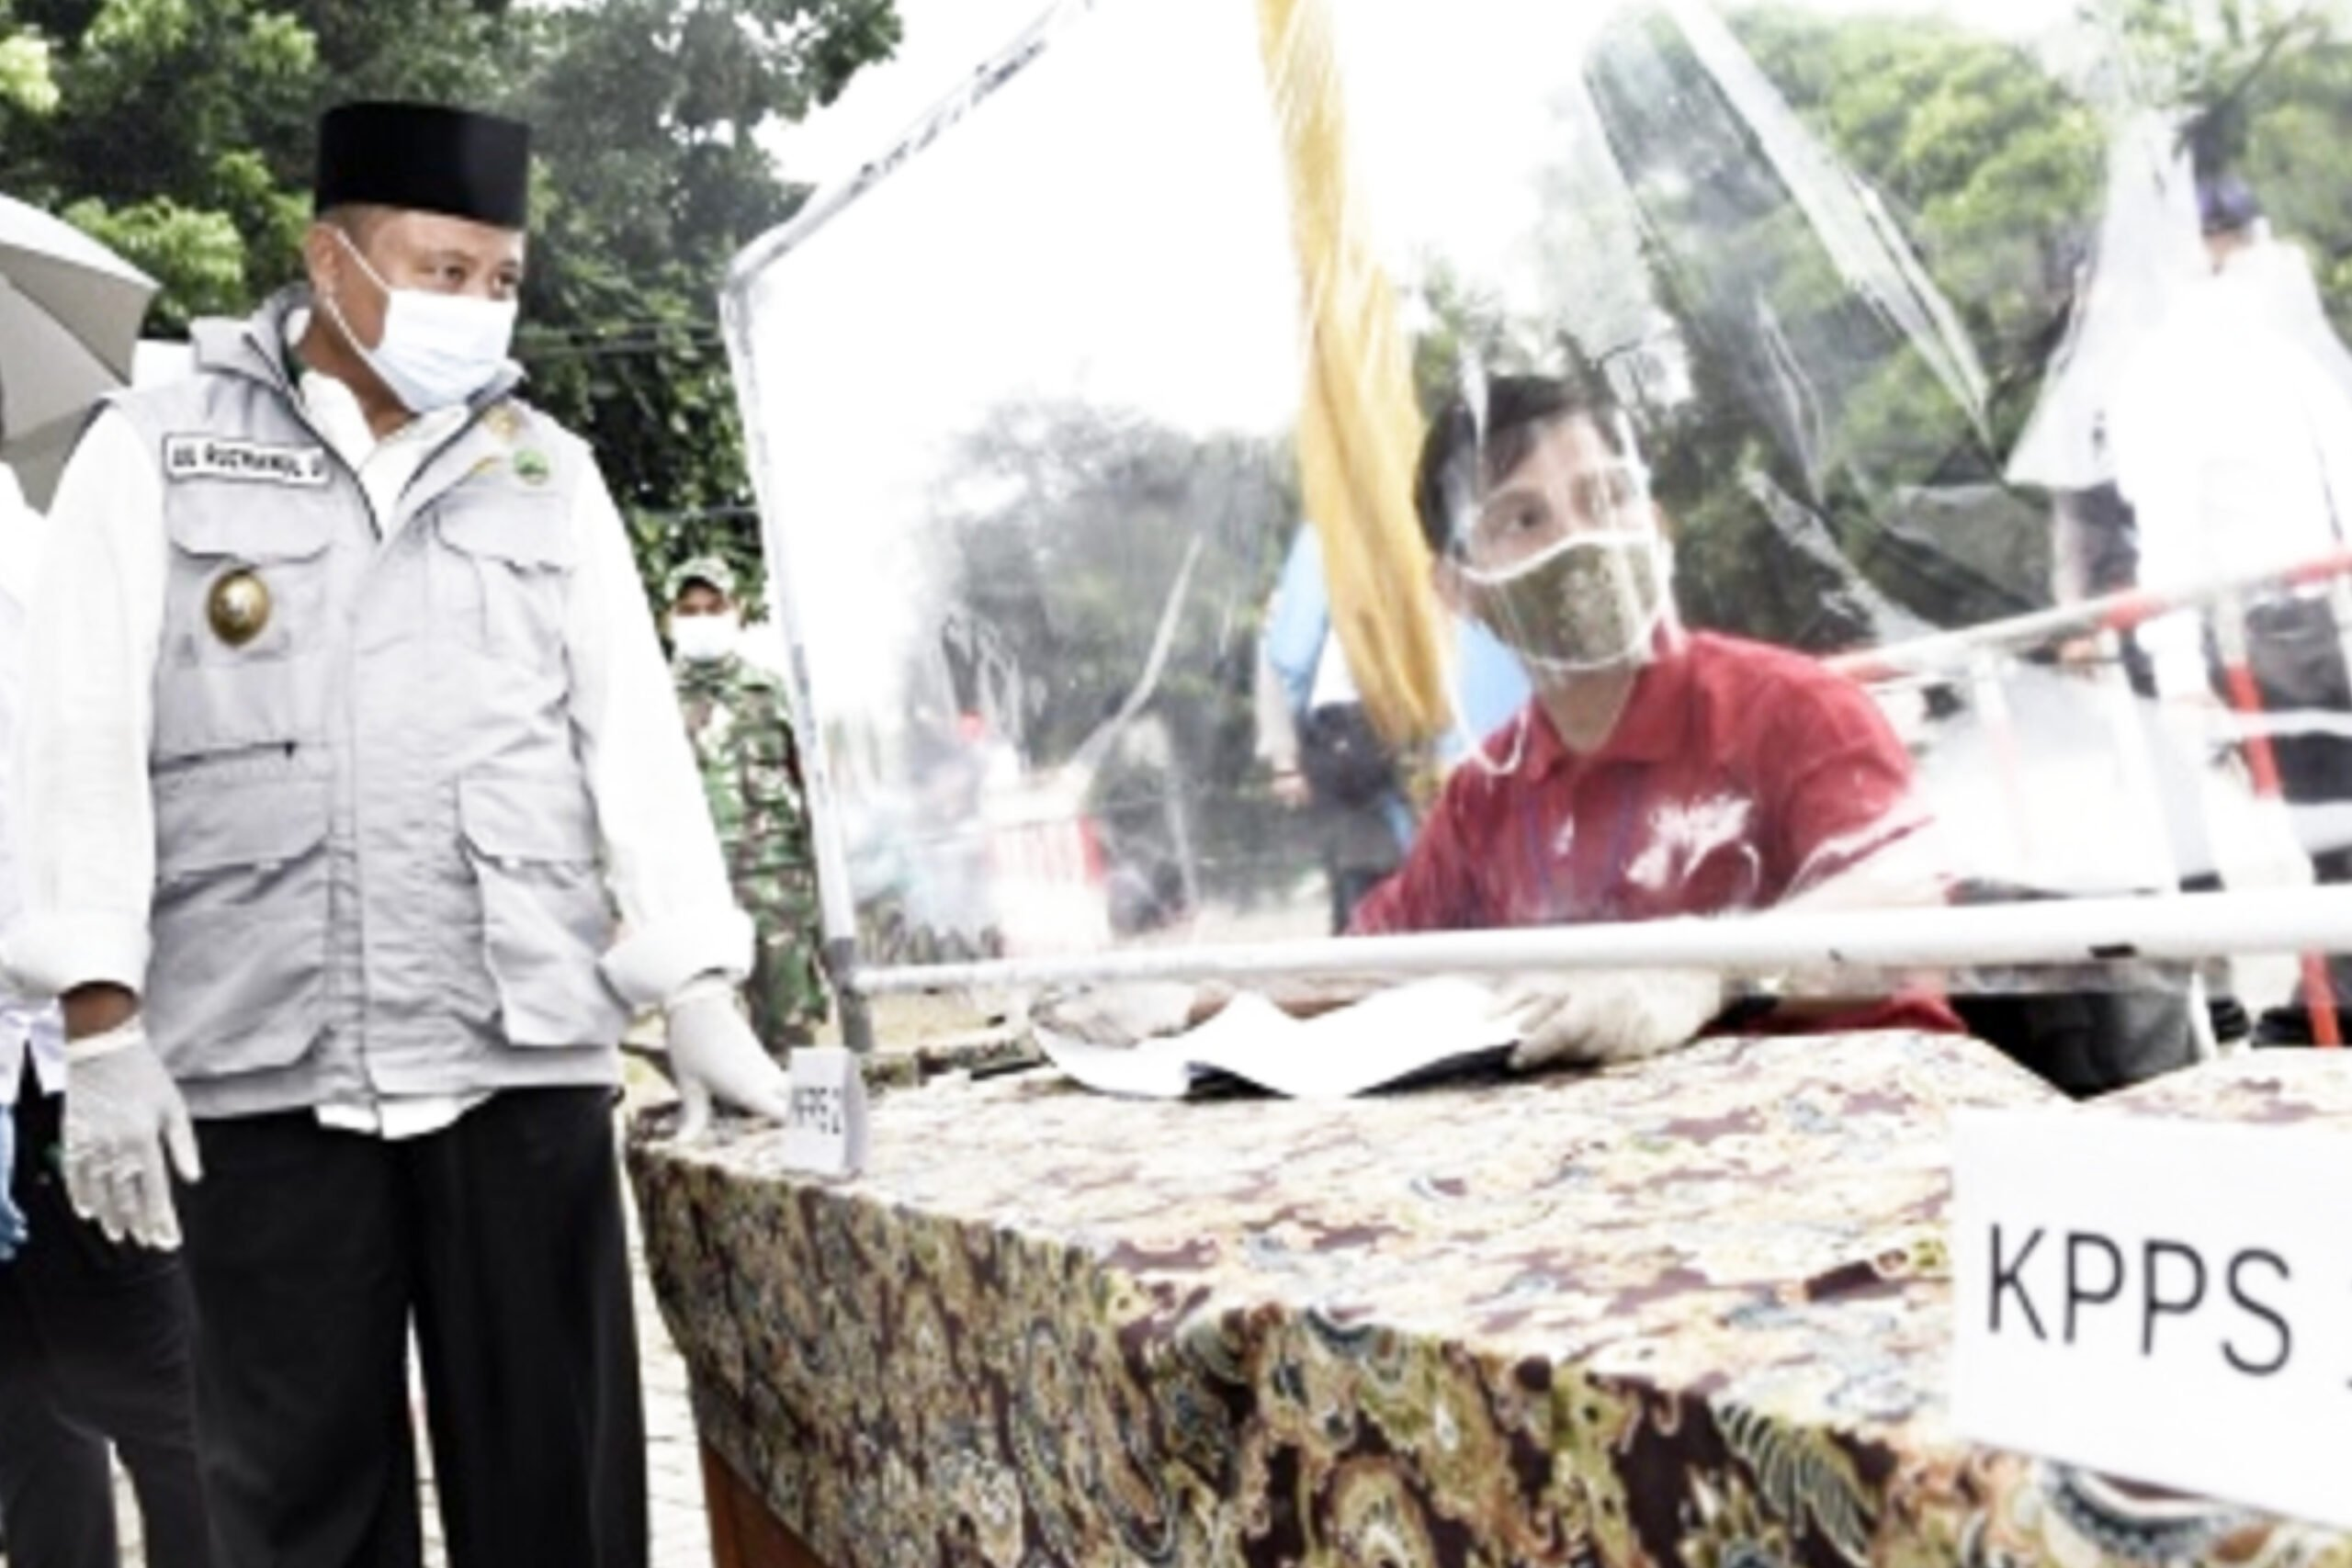 Wakil Gubernur Jawa Barat Tinjau Pilkades Serentak Tahun 2020 231